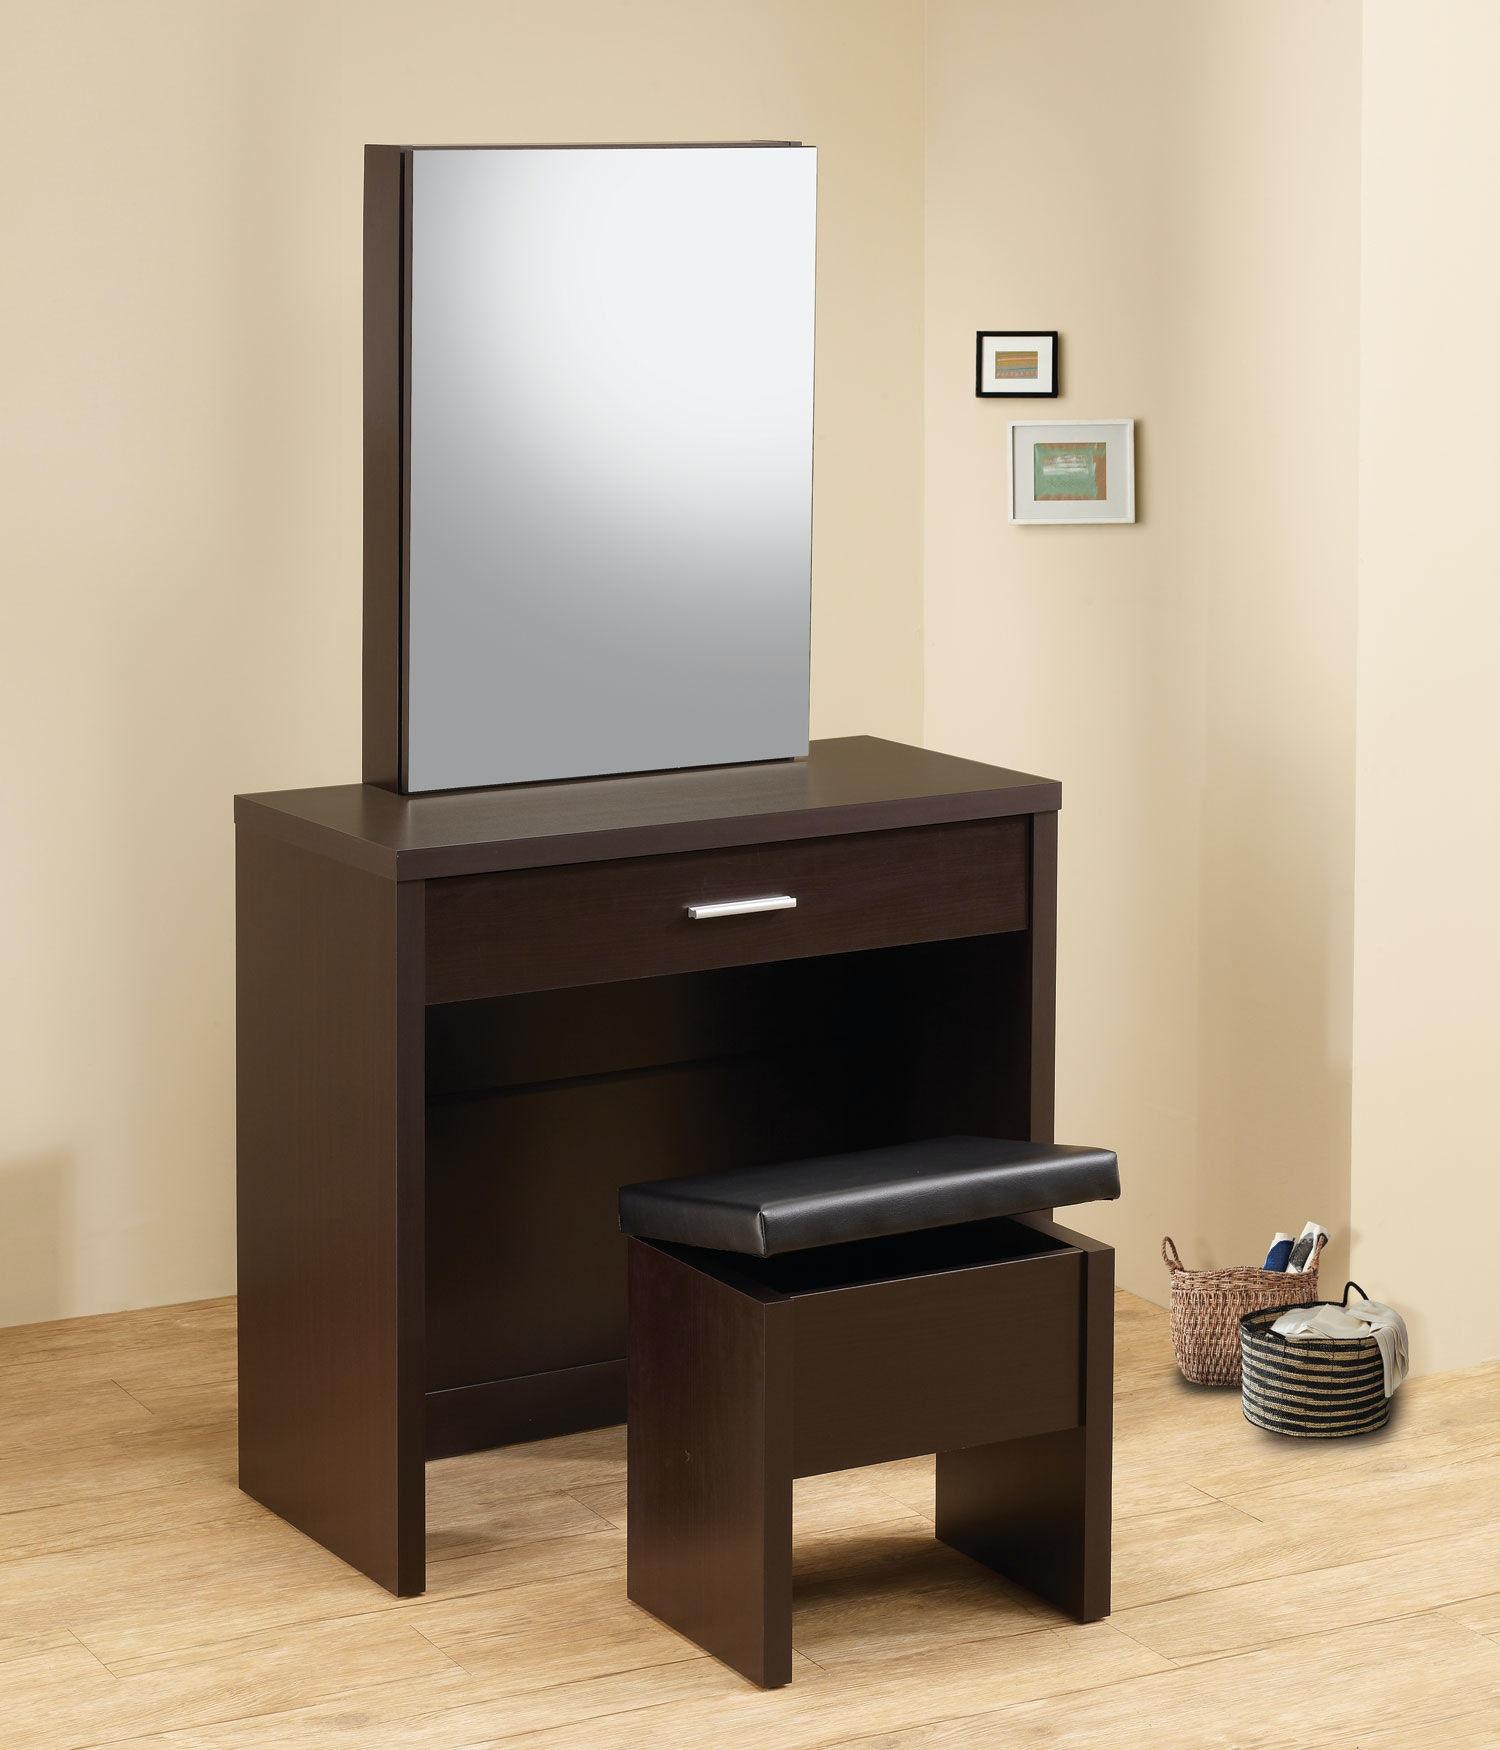 Furniture Kingdom